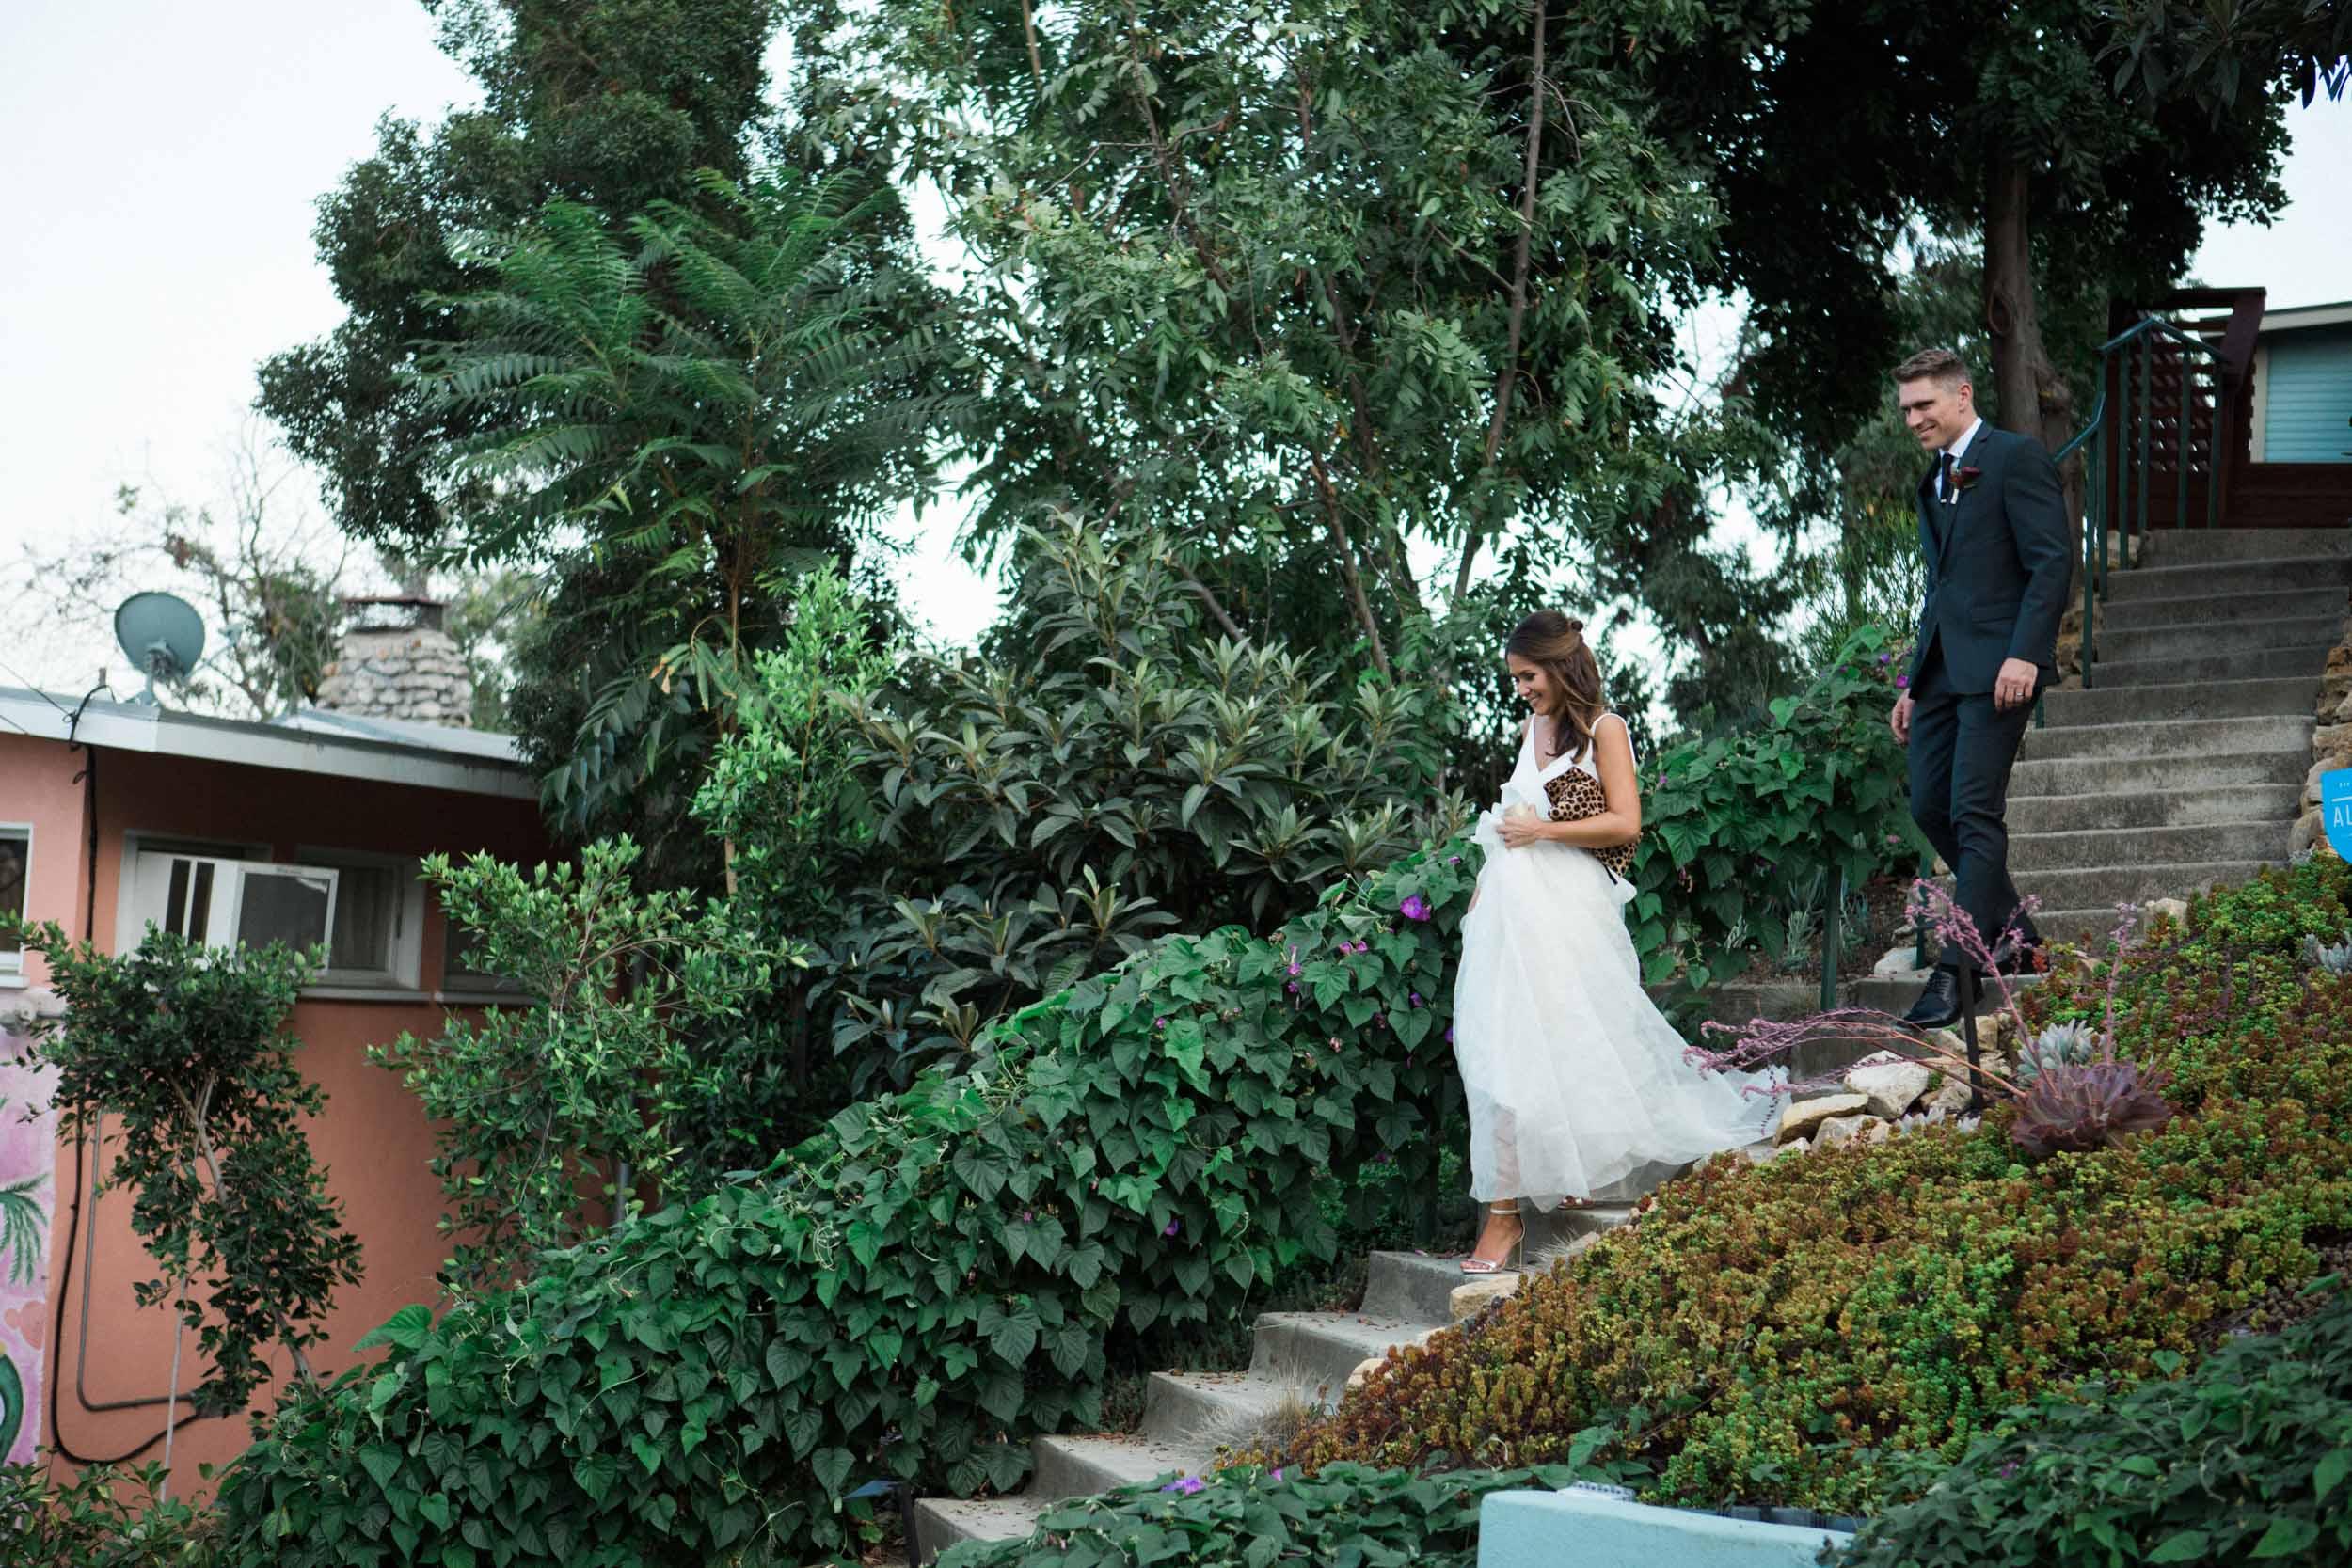 BKM-Photography-Highland-Park-Los-Angeles-Backyard-Wedding-0038.jpg